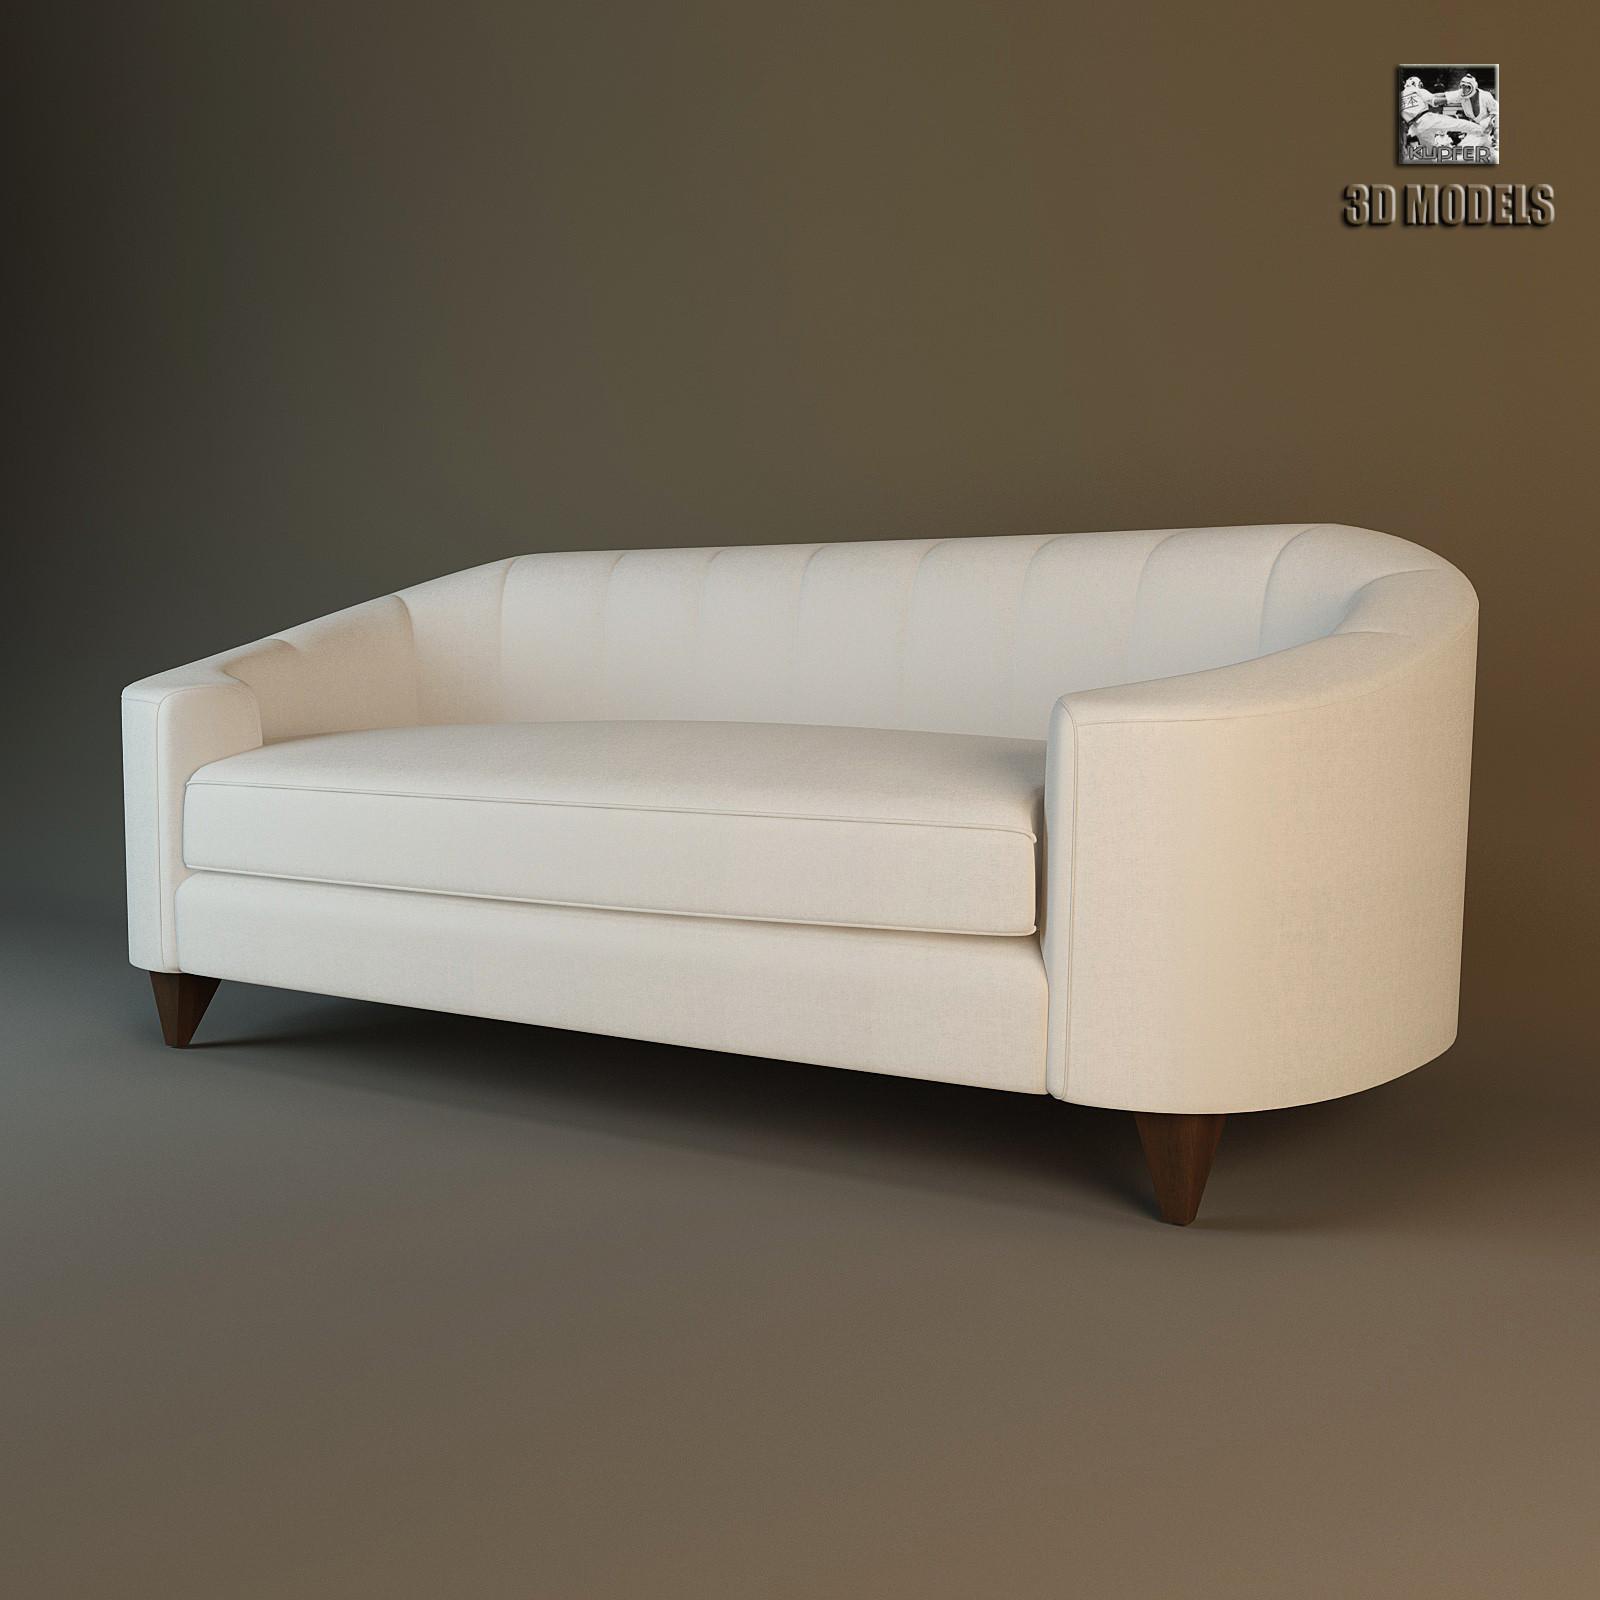 oval sofa jackson brantley reviews baker 63881 81 3ds